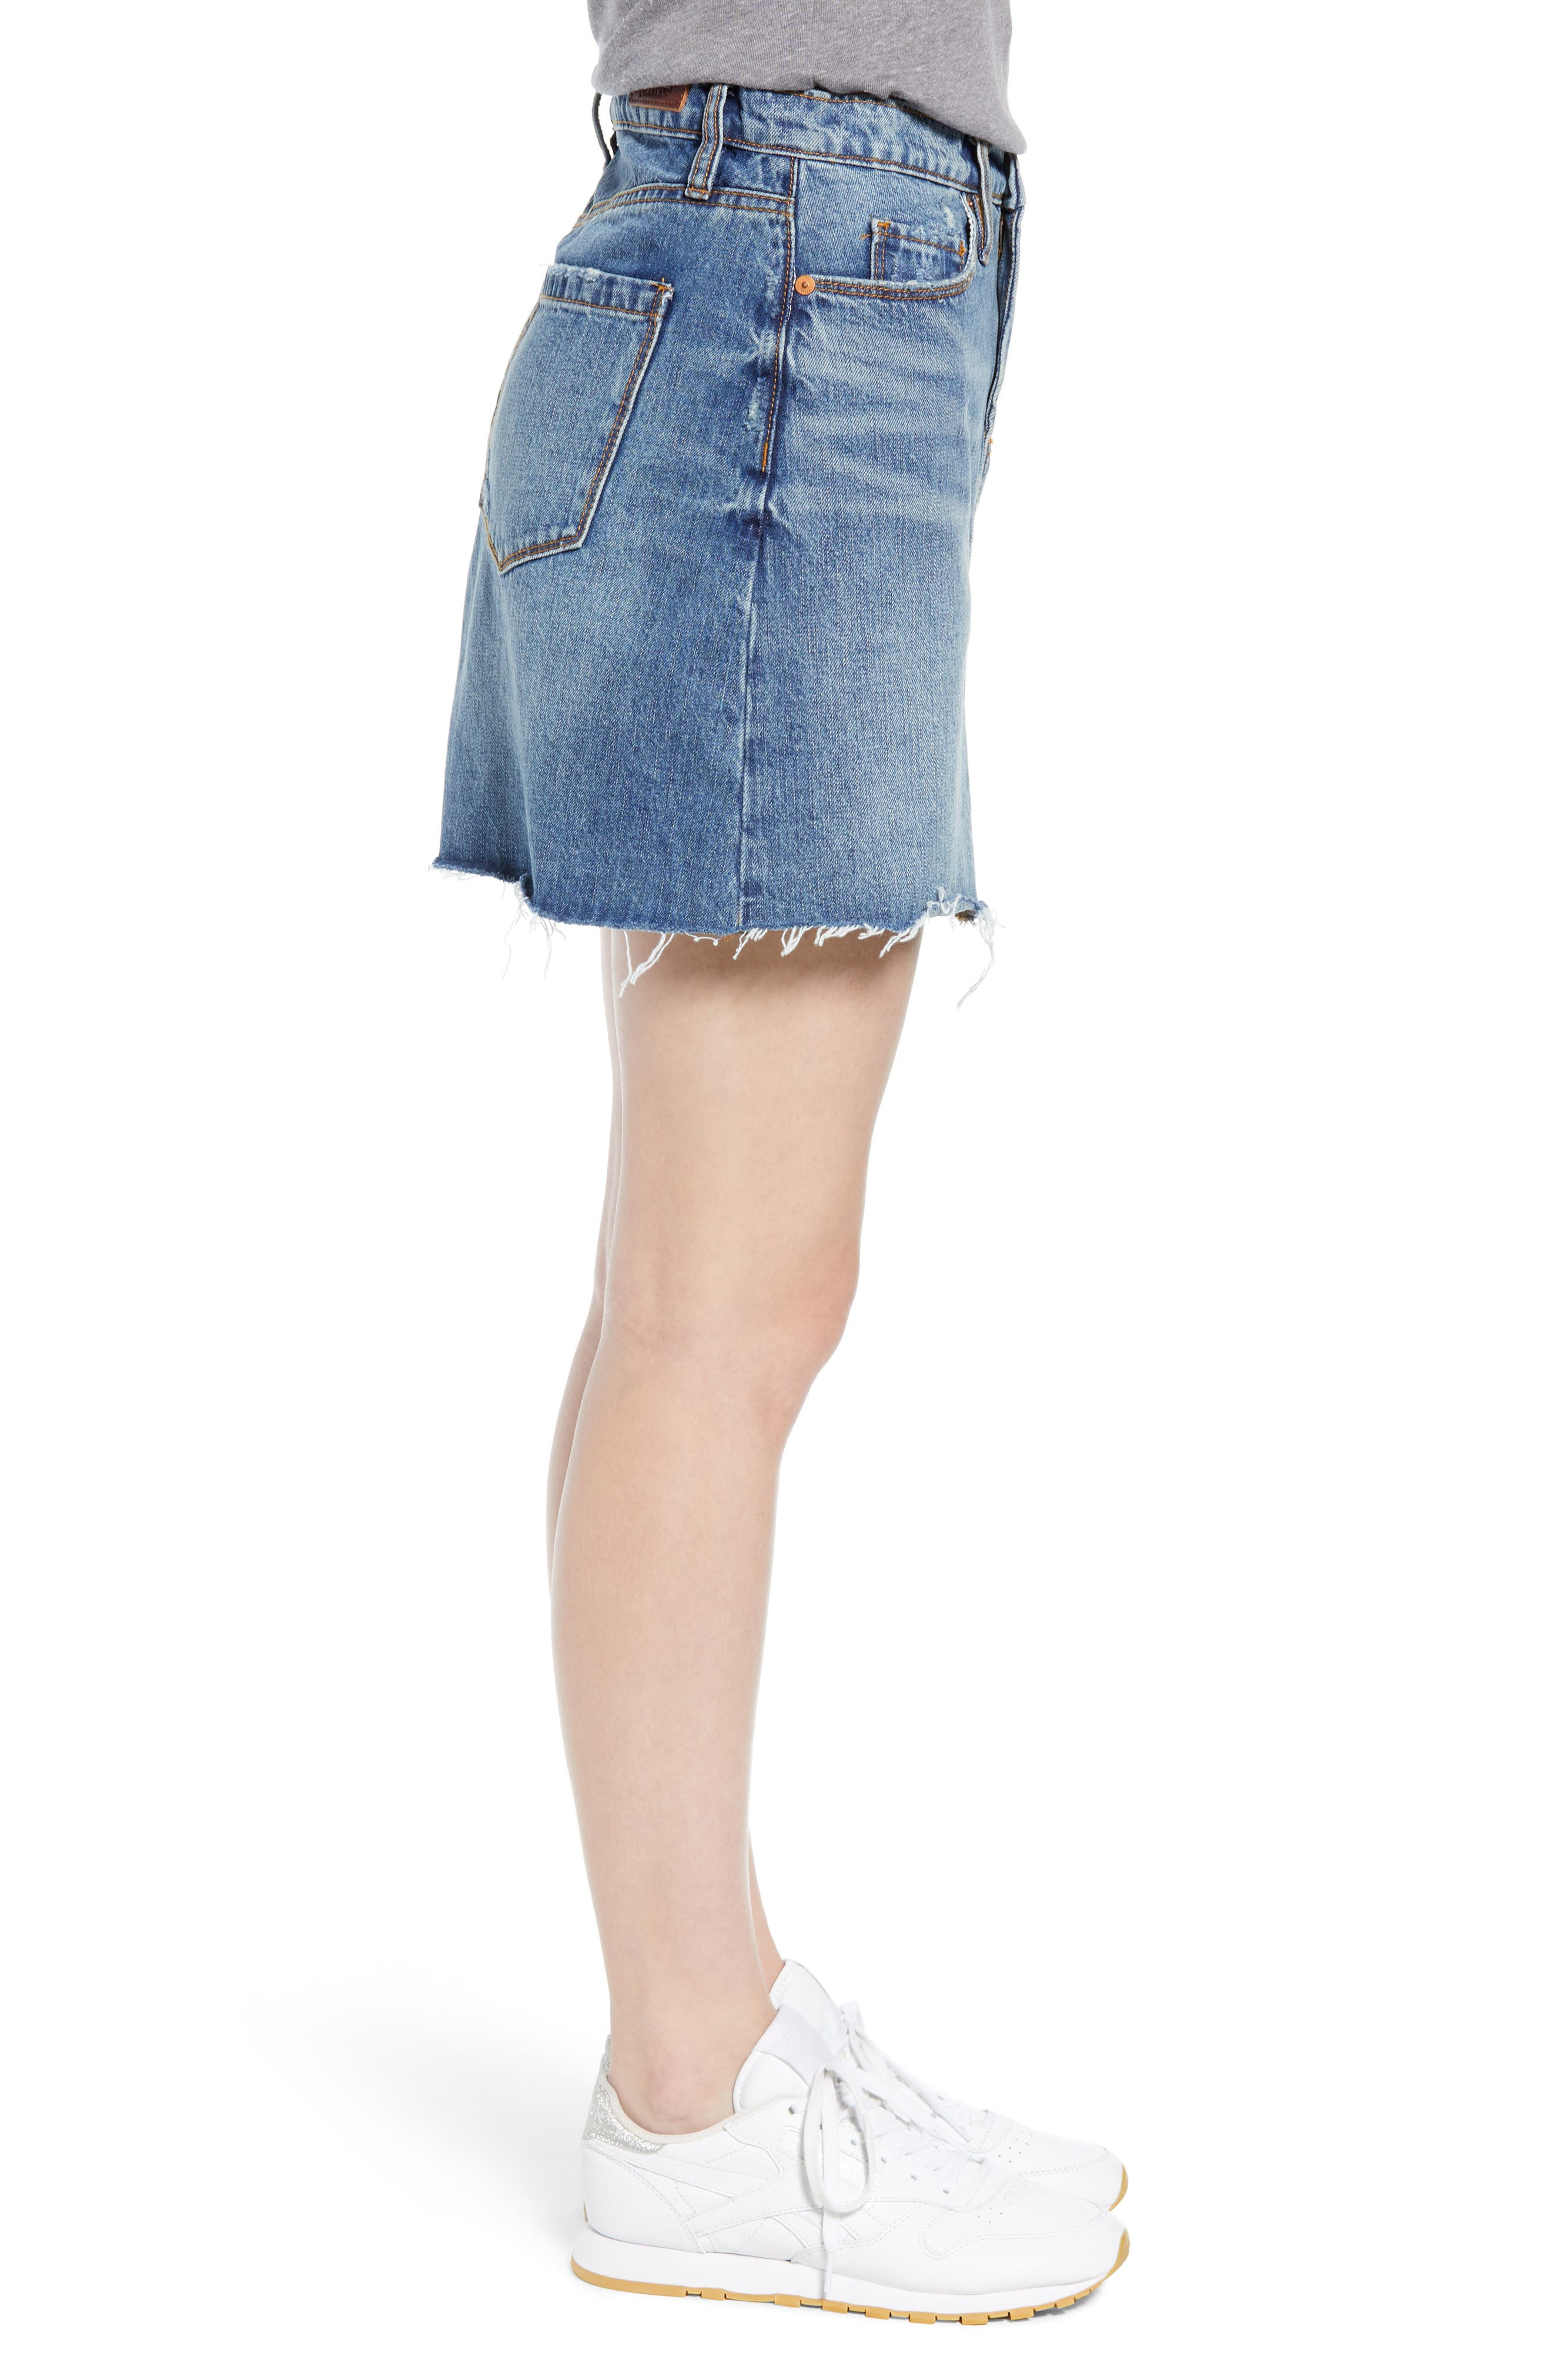 BLANKNYC, Way Back When Cutoff Denim Skirt, Alternate thumbnail 4, color, 400